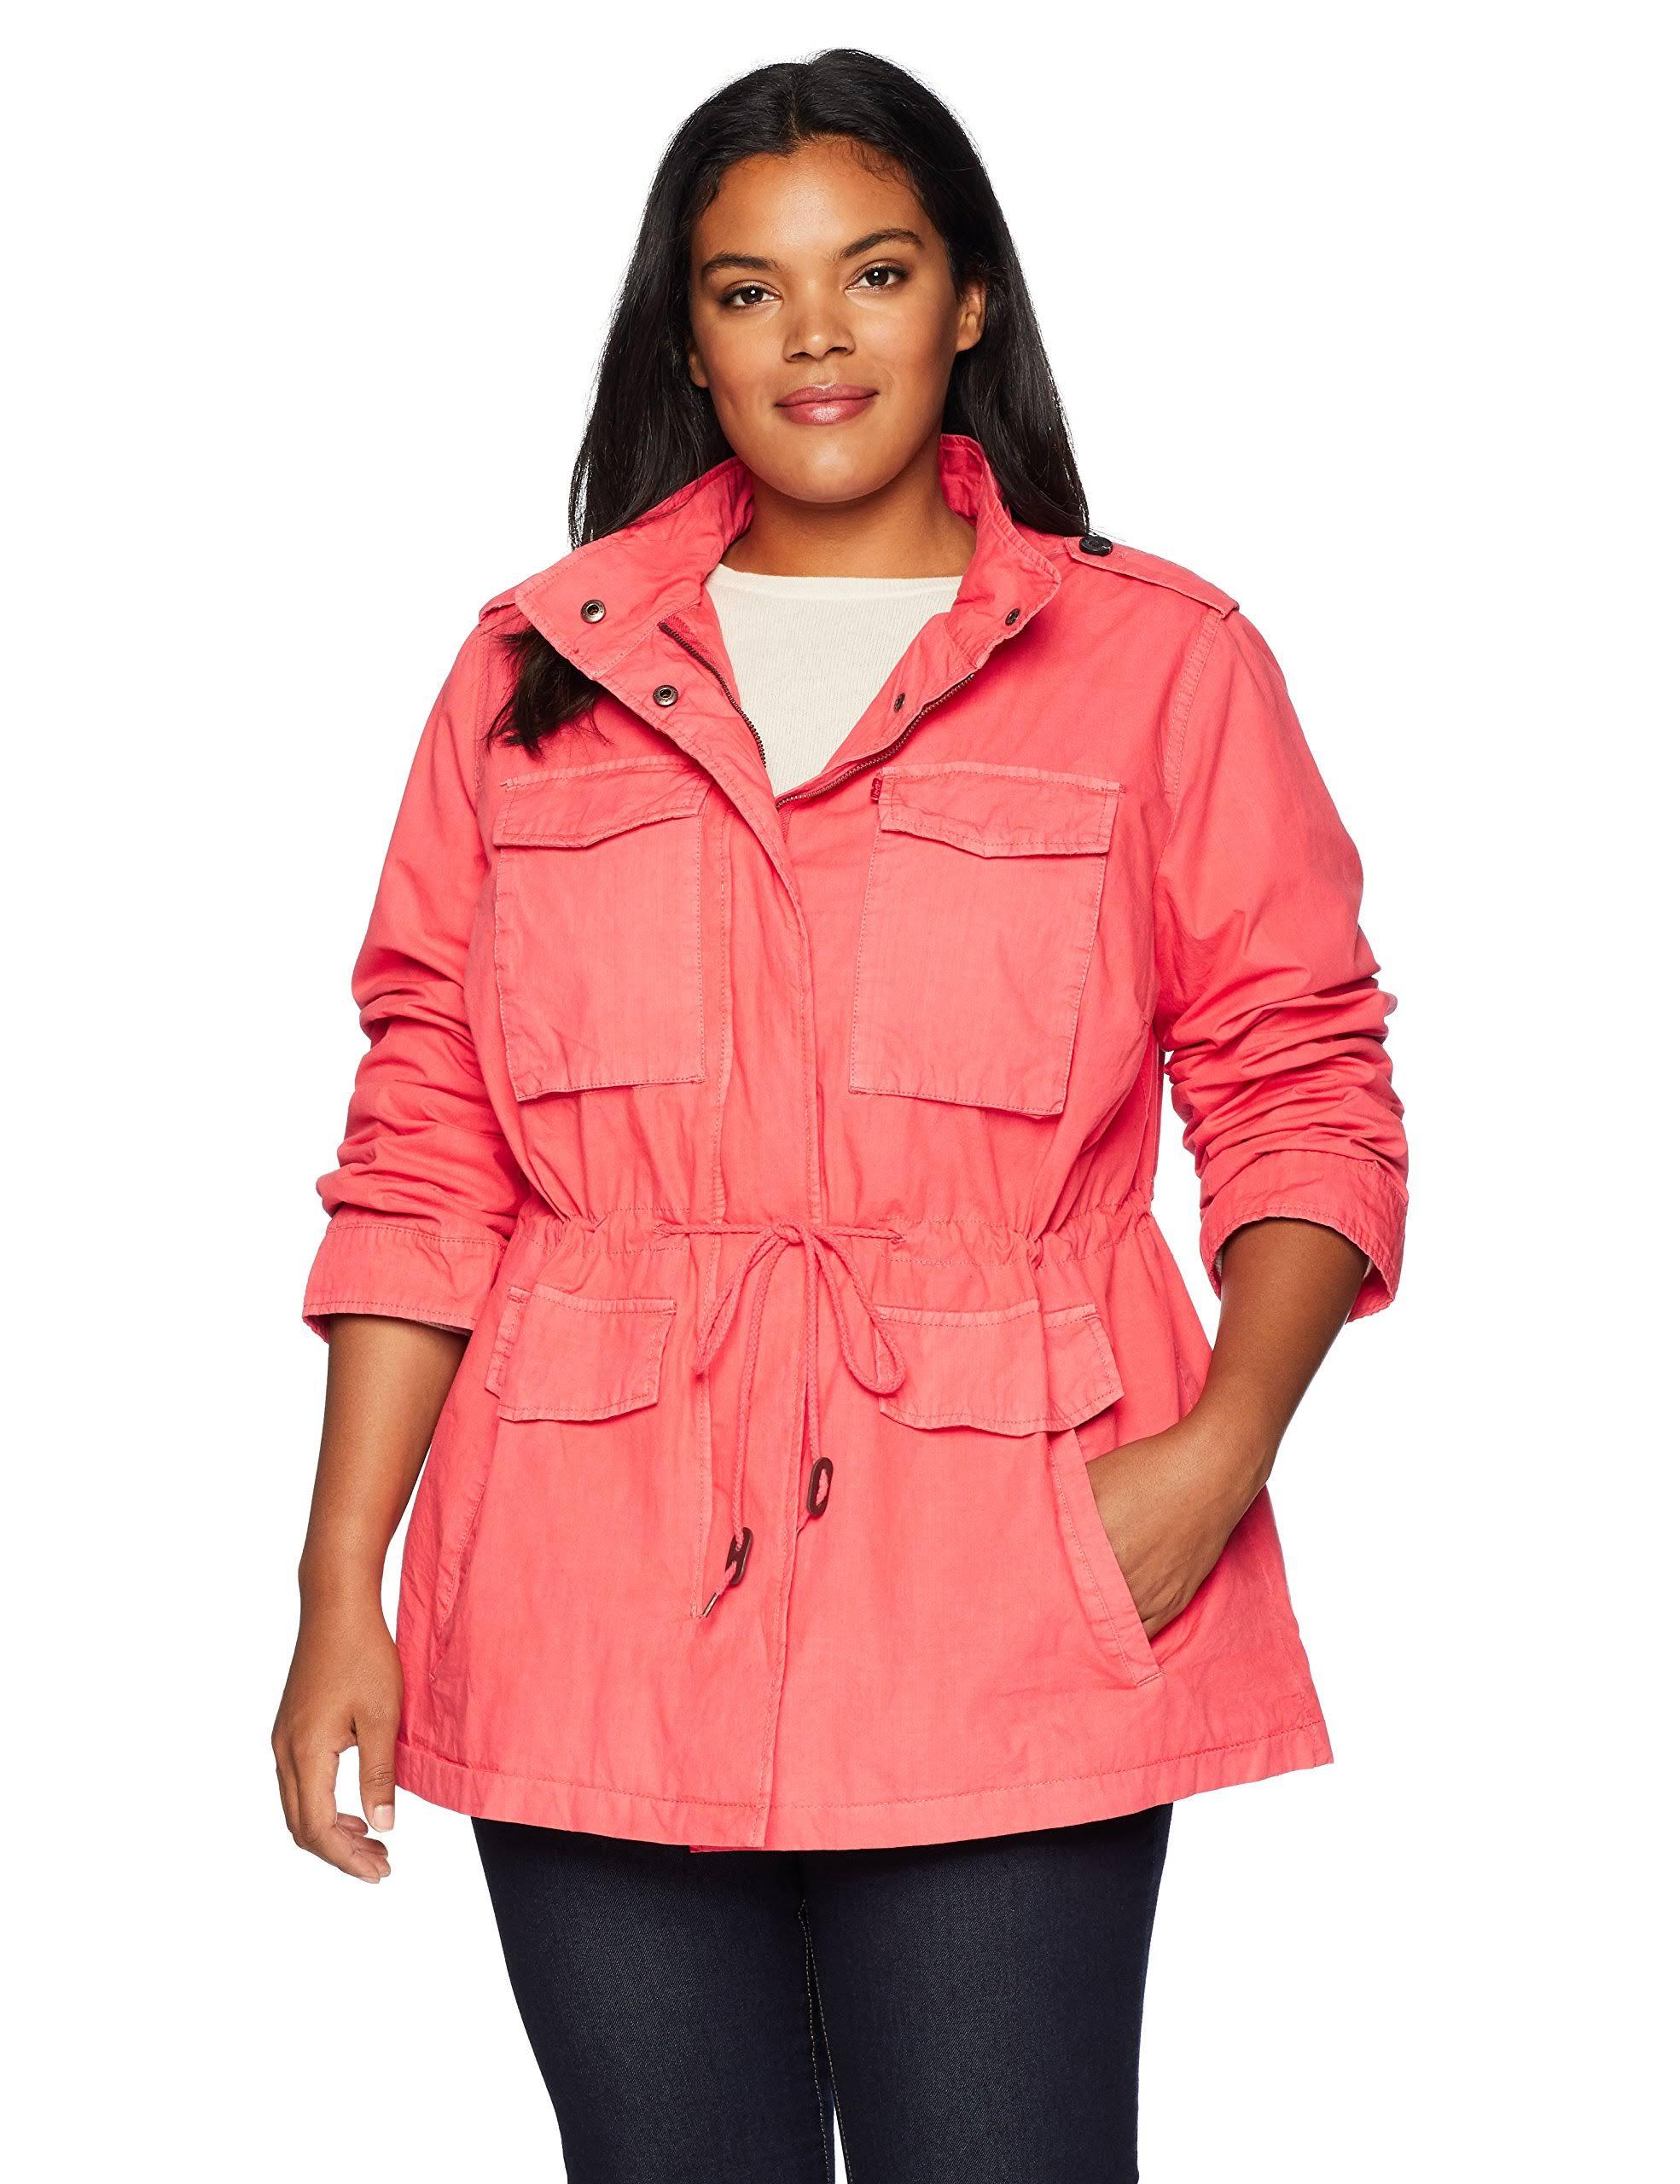 Jacket Orange Levi's Size Cotton Utility Plus 2x wAAZqUI